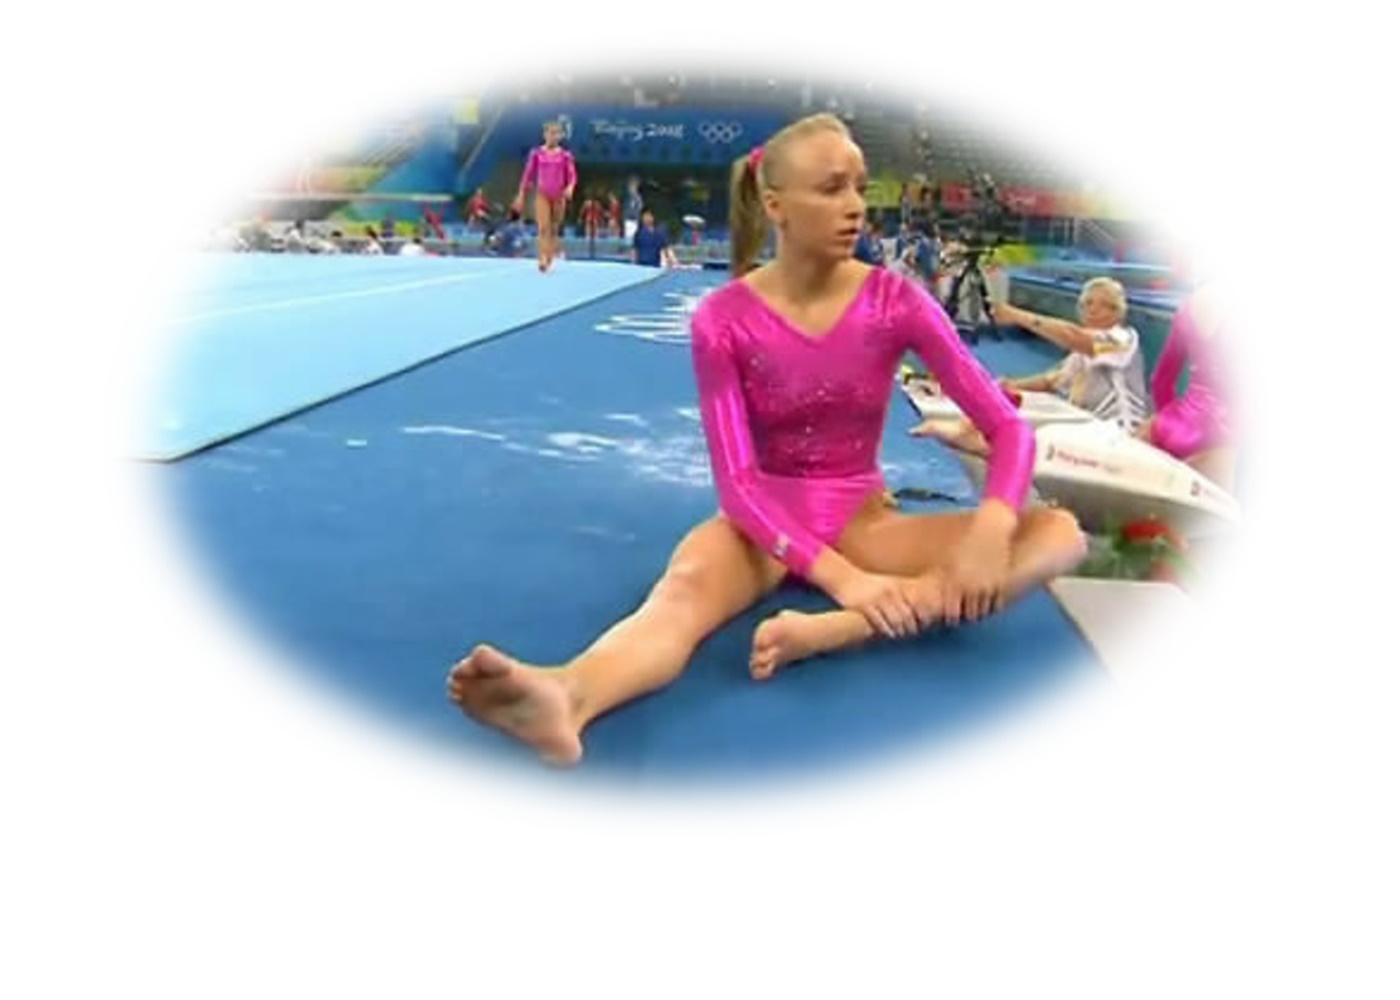 Gymnastics and More!: Januar 2012 Nastia Liukin Gymnastics Wallpaper